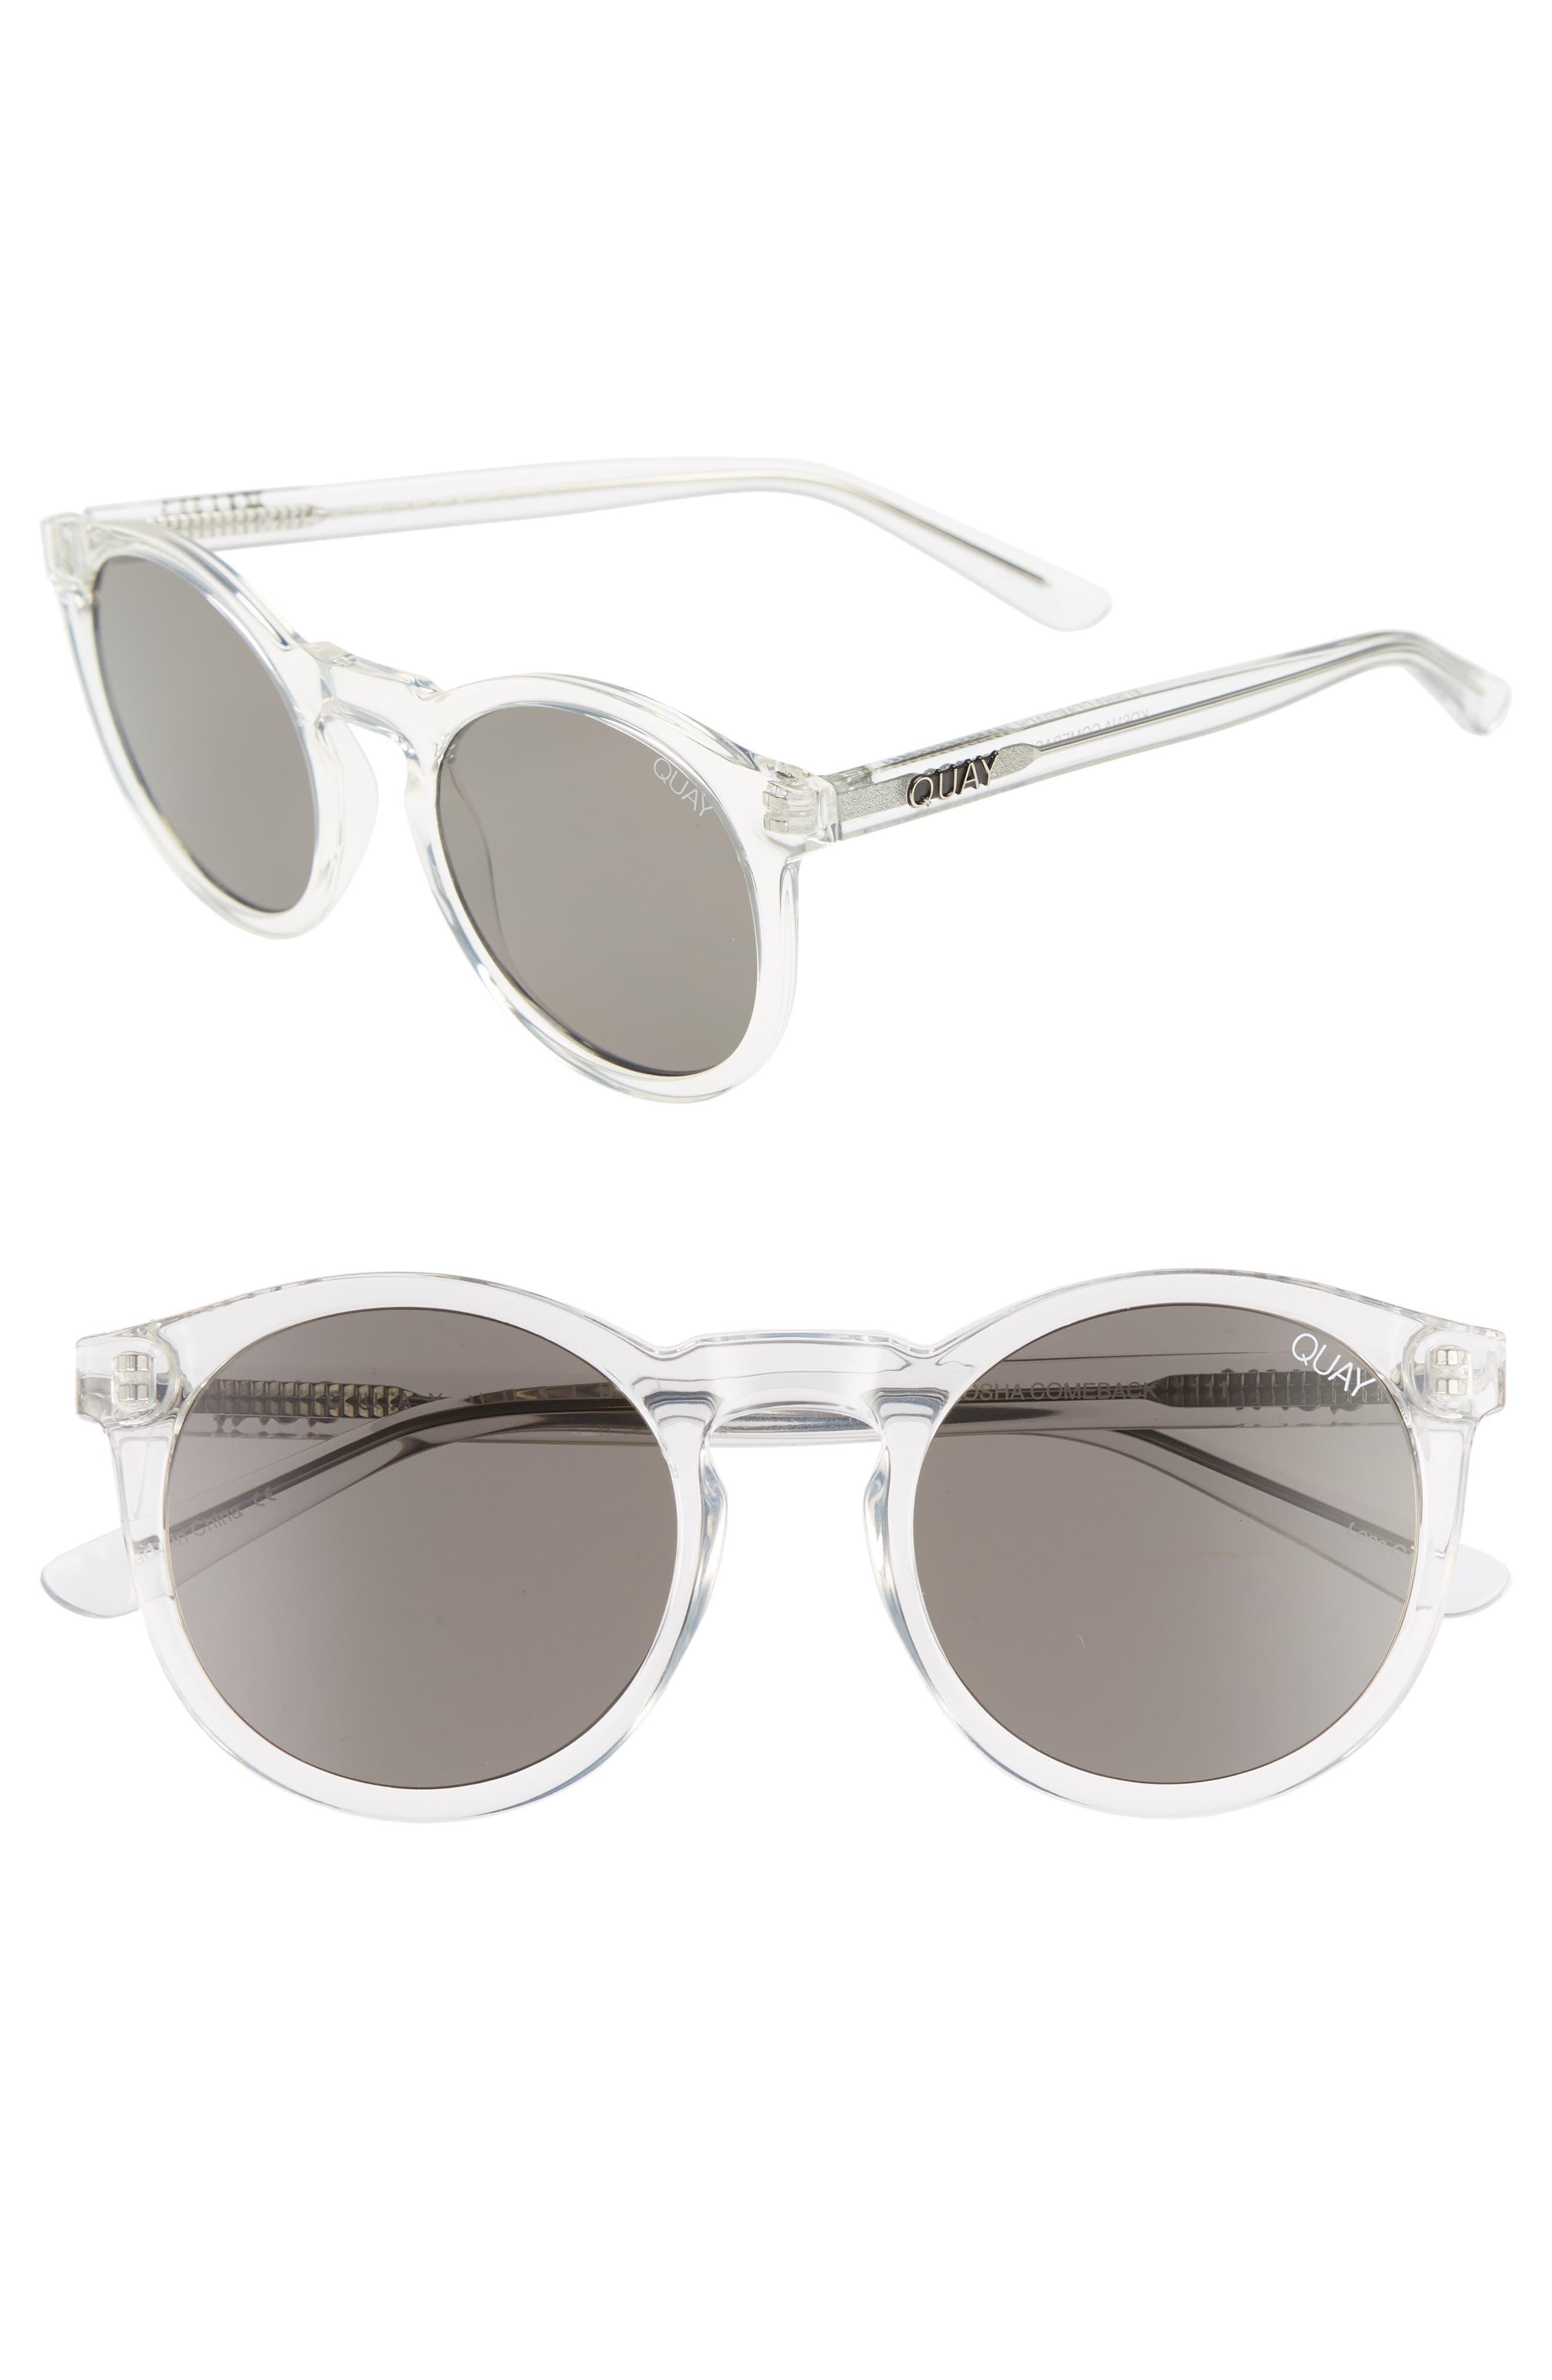 Kosha 49mm Round Sunglasses,                         Main,                         color, 100